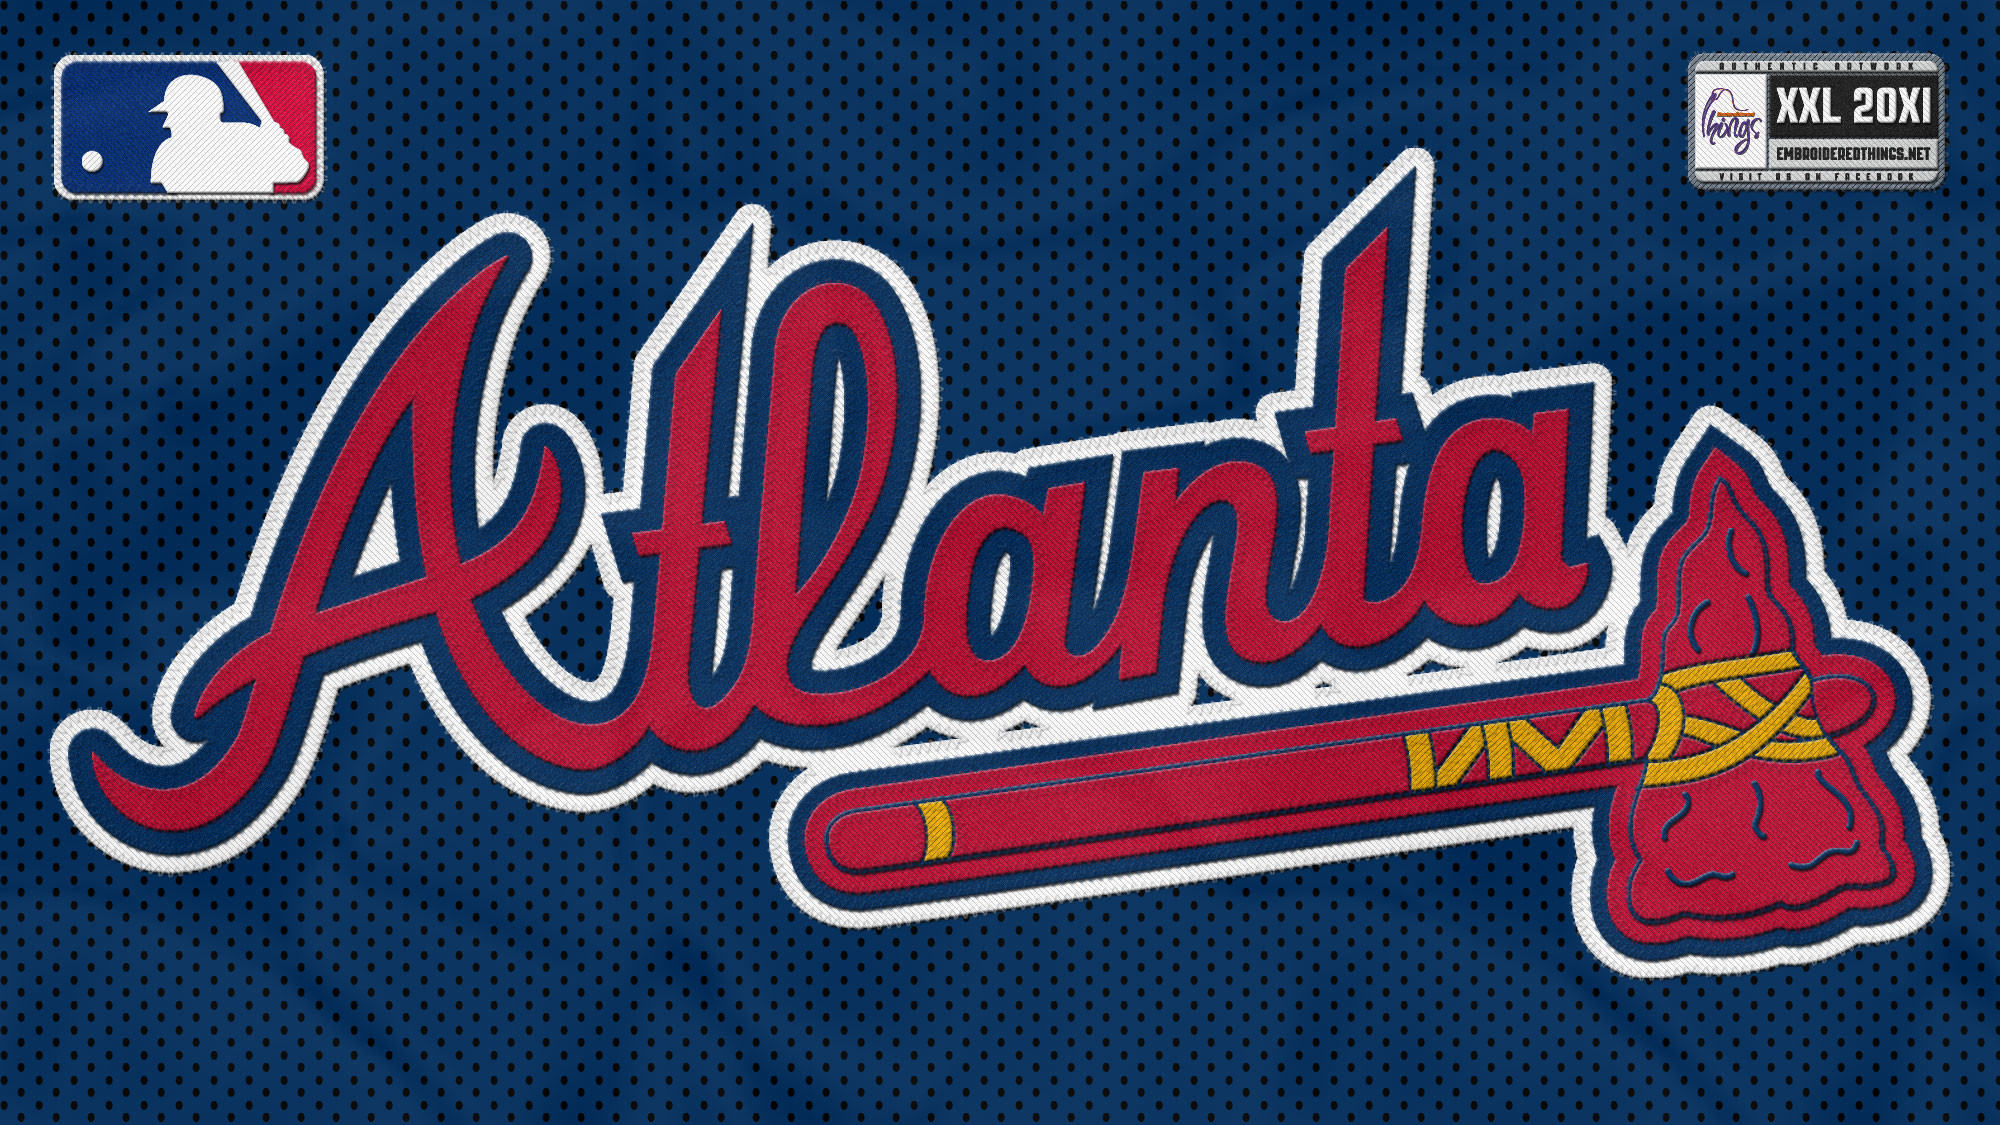 Atlanta Braves Team Wallpaper Images | Crazy Gallery